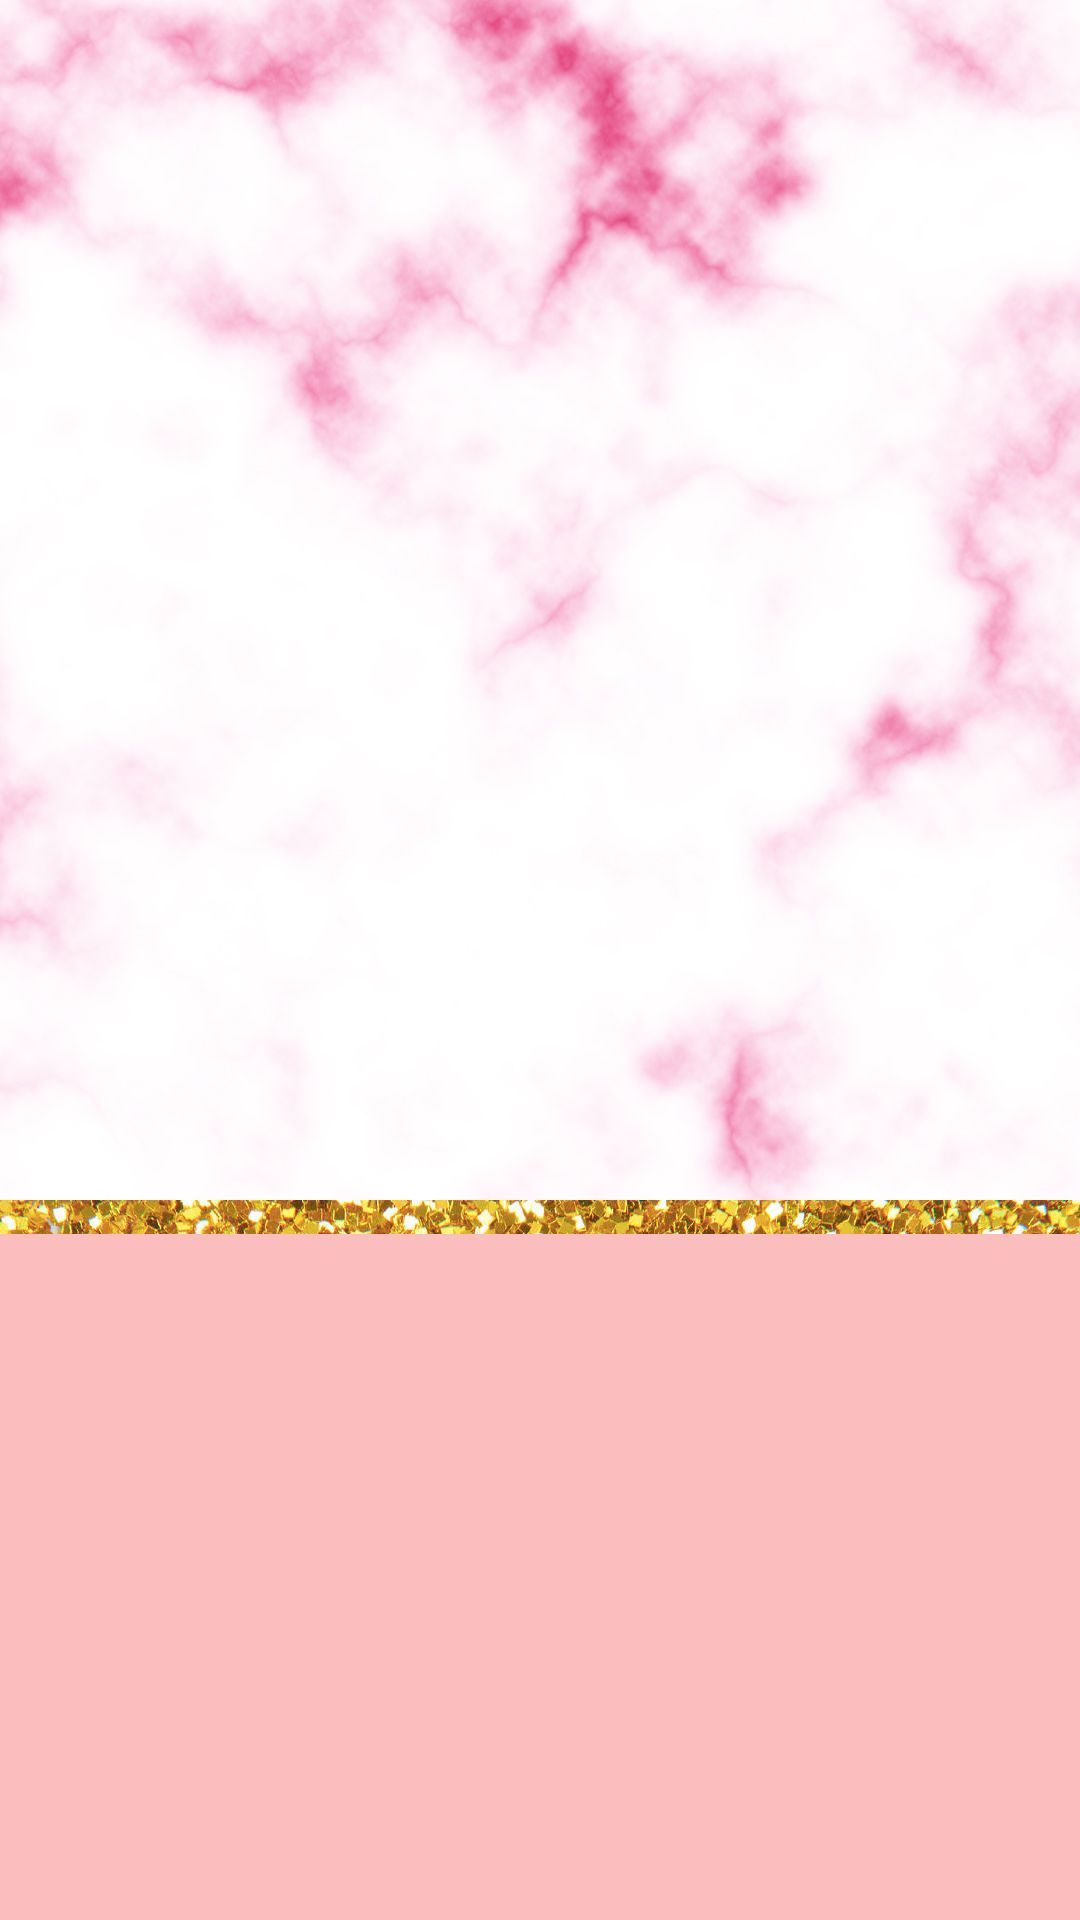 Bildresultat For Rose Gold Cute Wallpapers For Ipad Marble Iphone Wallpaper Marble Wallpaper